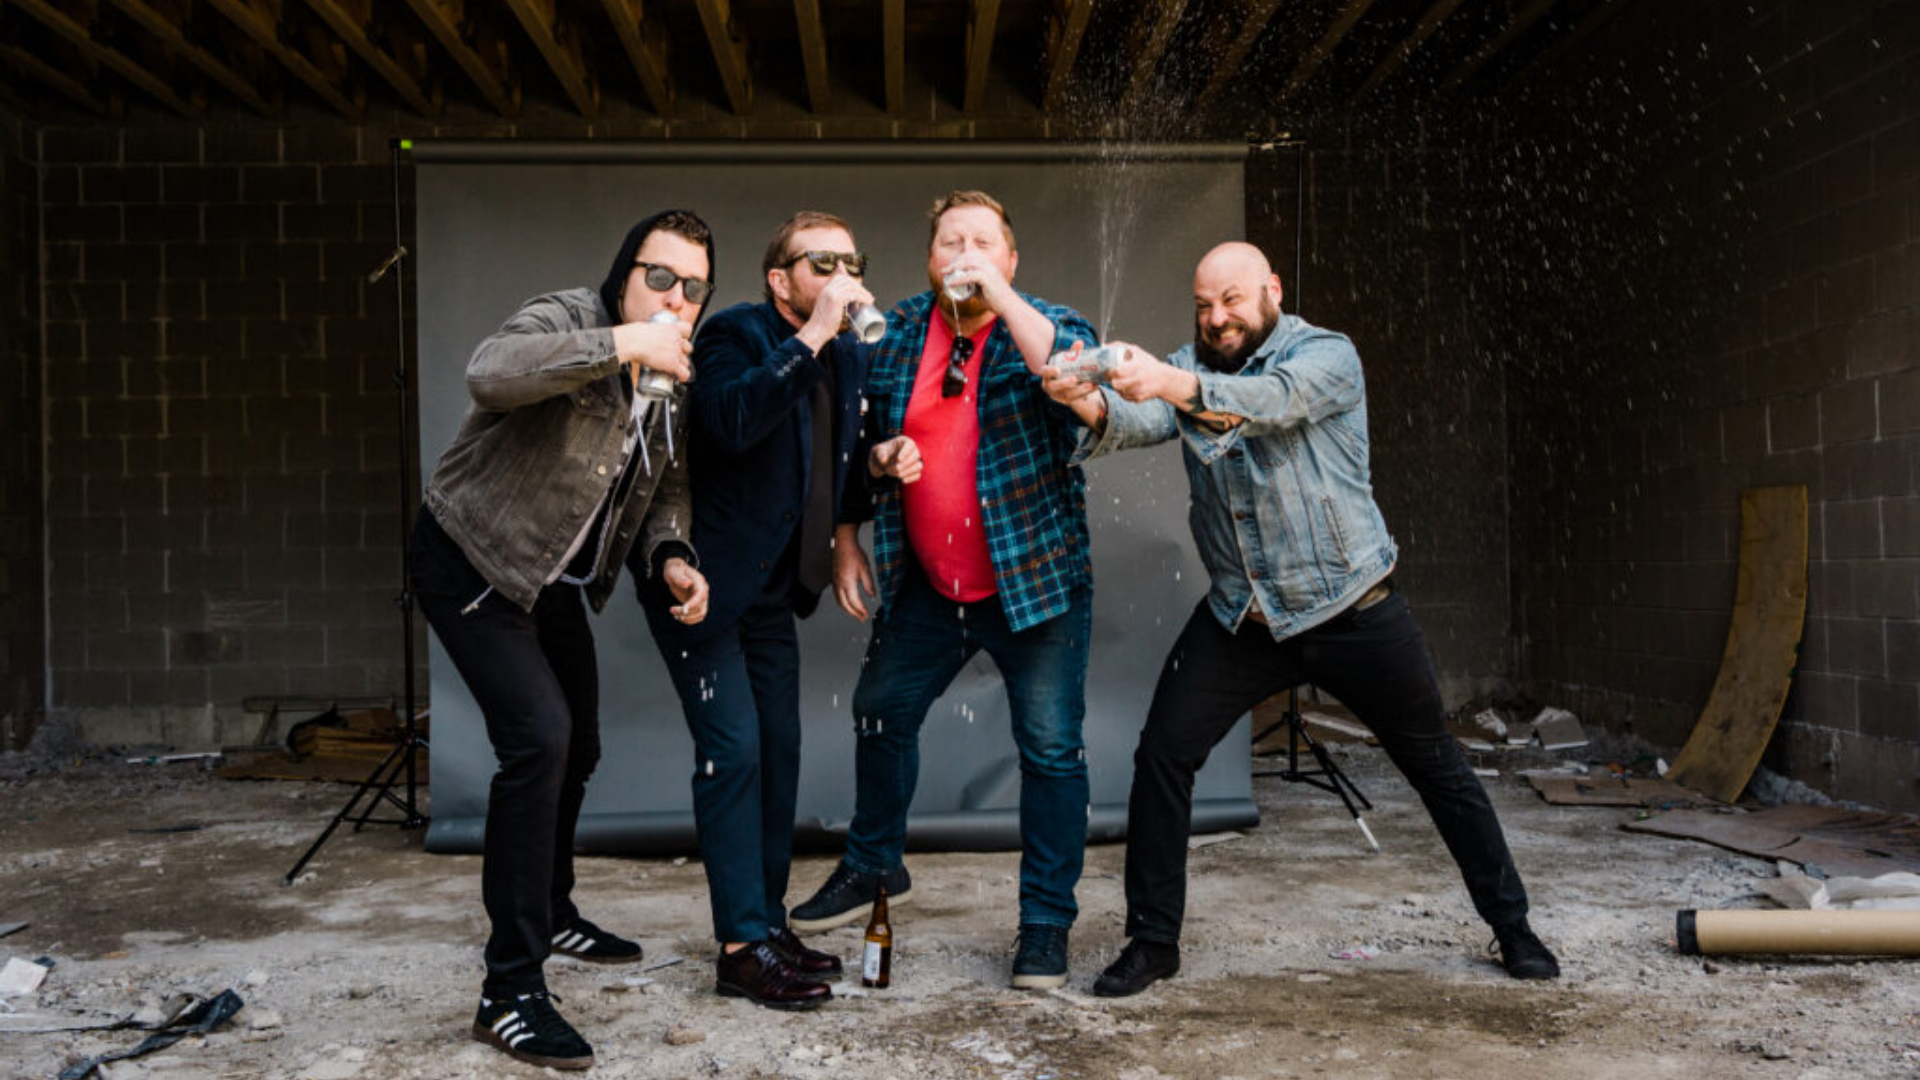 Work Party, banda de hardcore punk desde Chicago, Estados Unidos en Sábado Intenracional de Tropical Punk Records | Foto po Aaron Ehinger